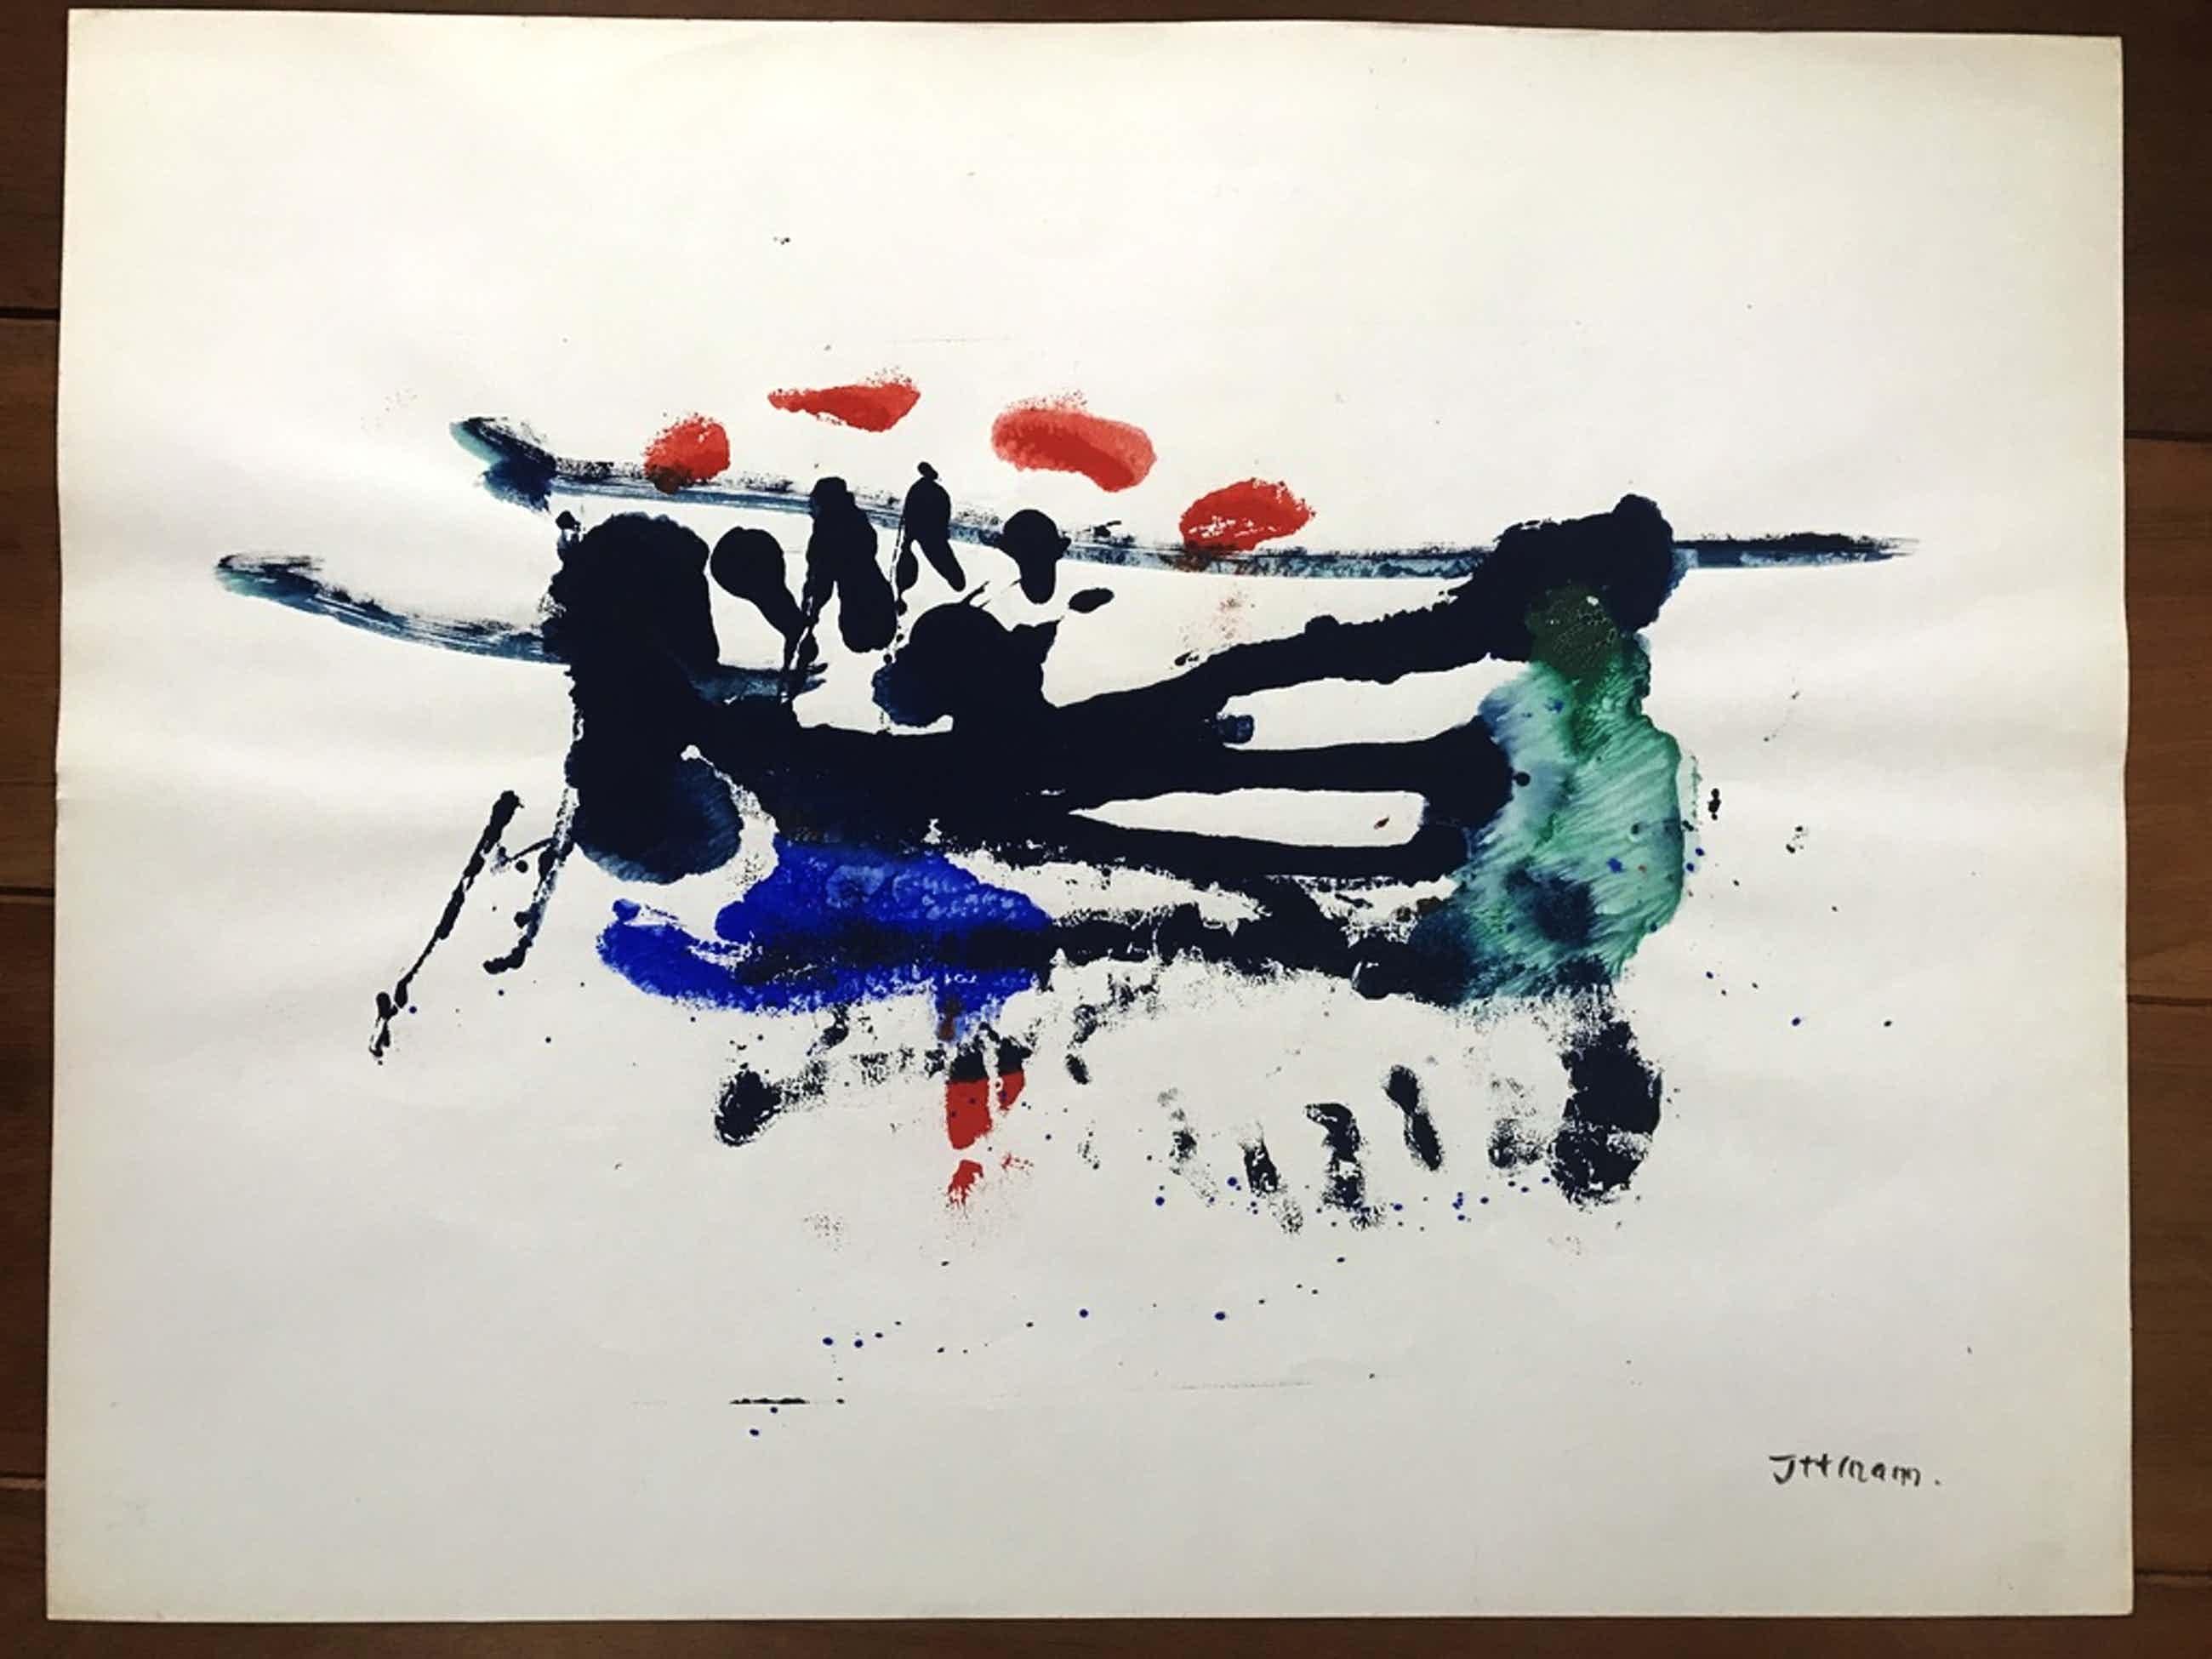 Hans ittmann aquarel moderne compositie  kopen? Bied vanaf 45!